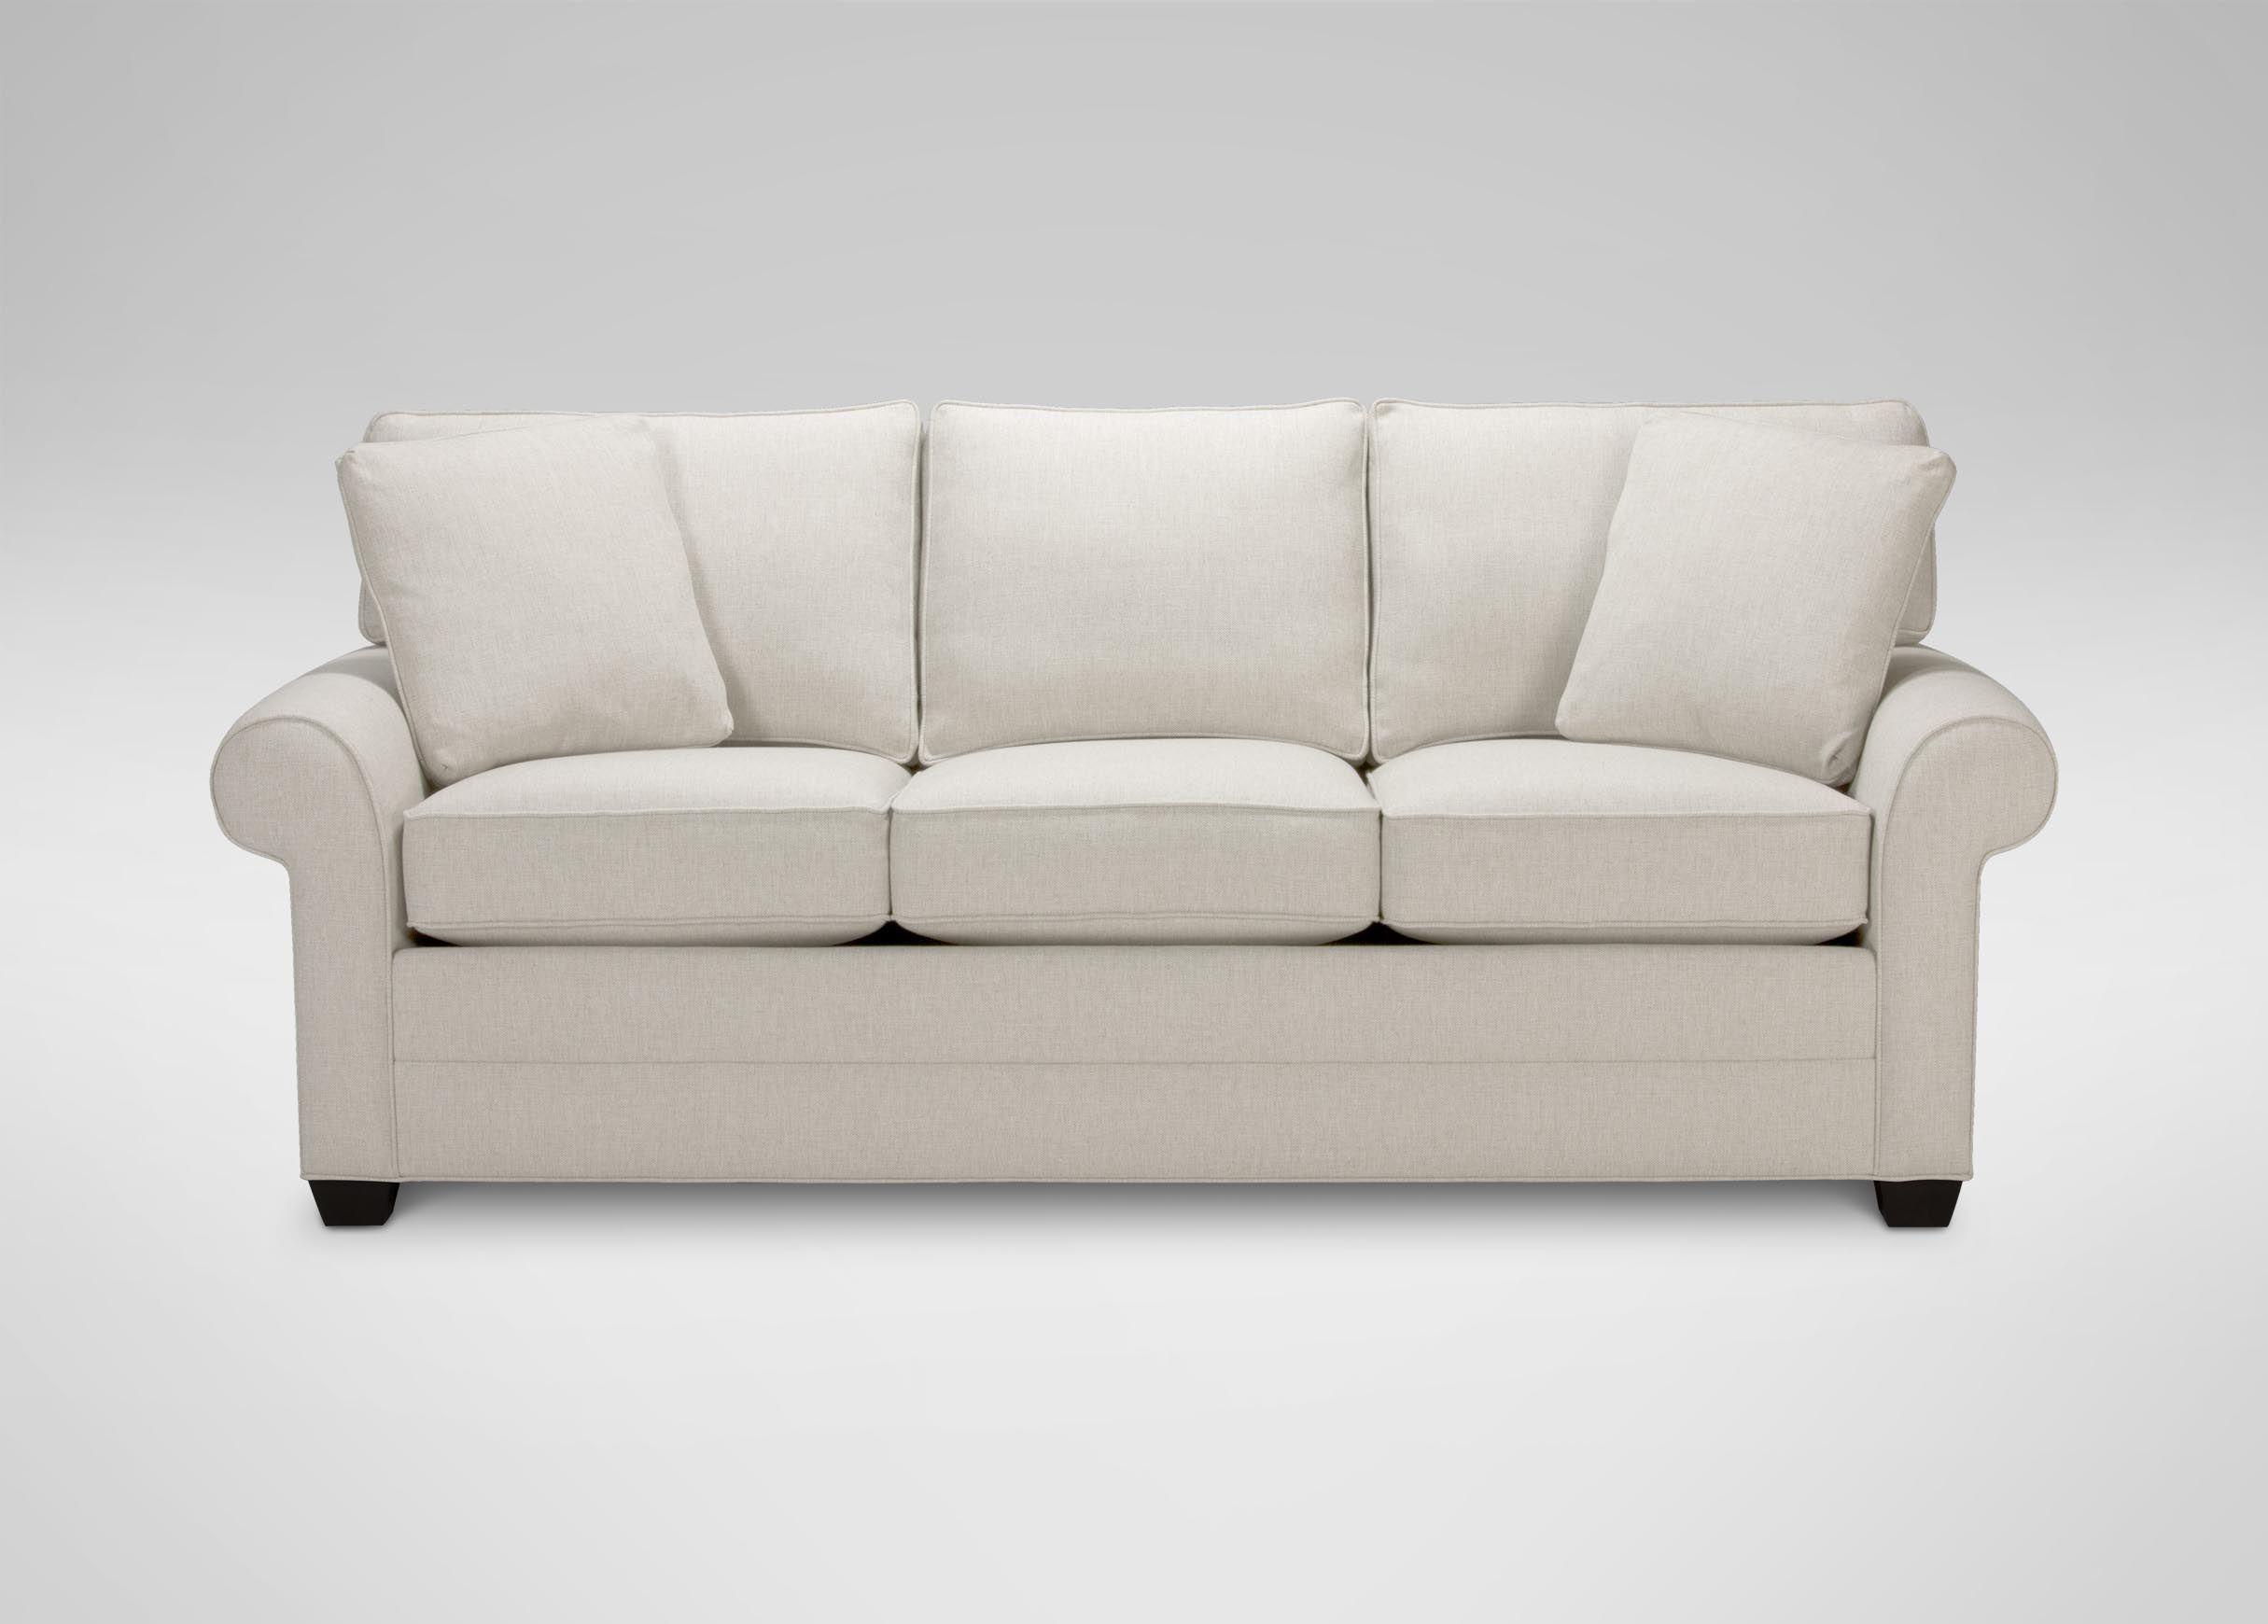 Ordinaire Bennett Roll Arm Sofa, Quick Ship | Sofas U0026 Loveseats